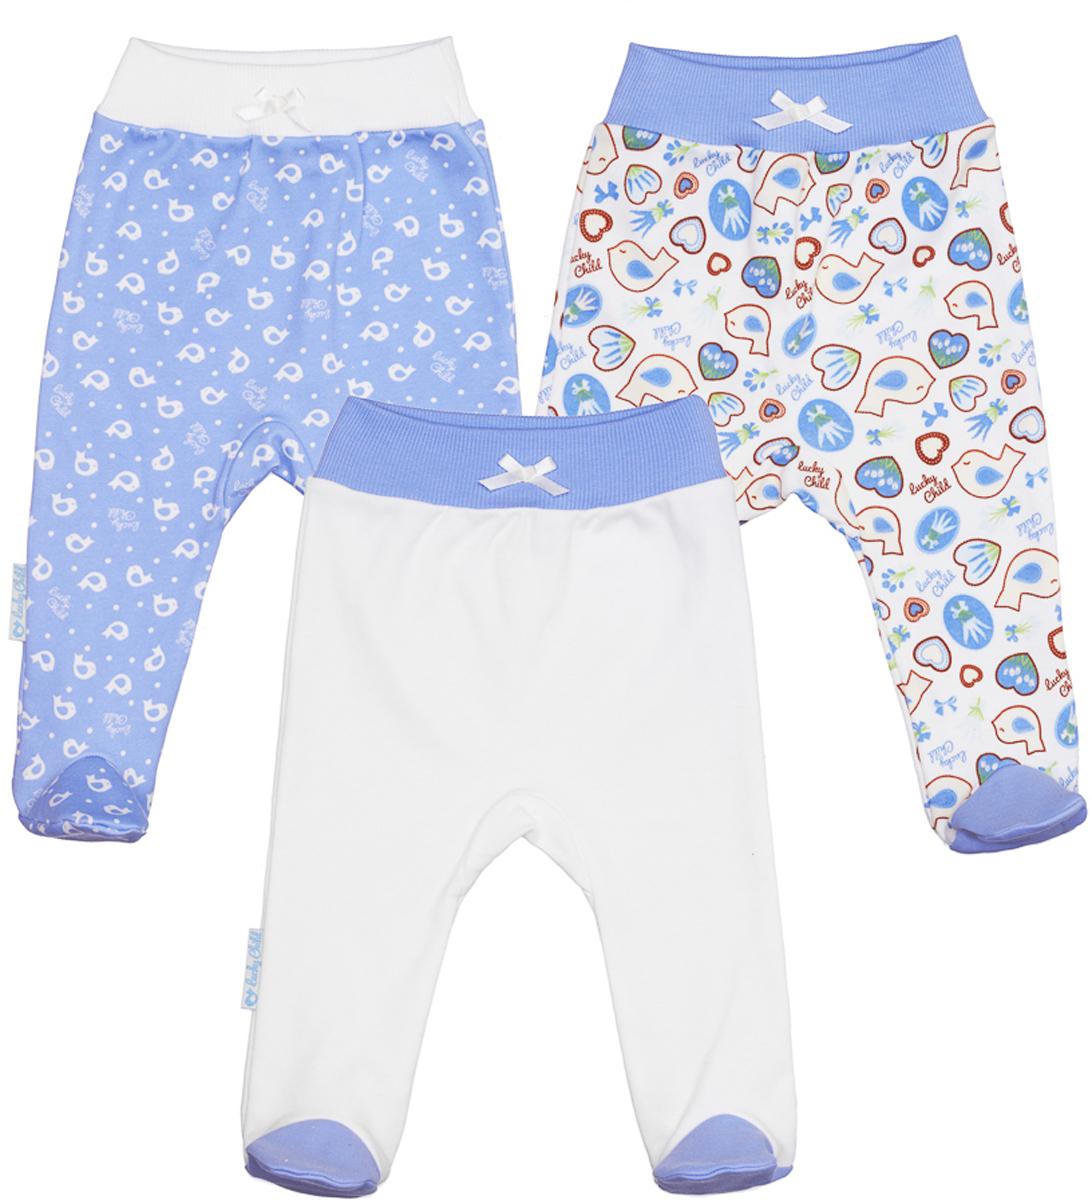 Ползунки Lucky Child, цвет: голубой, белый, 3 шт. 30-184. Размер 80/86